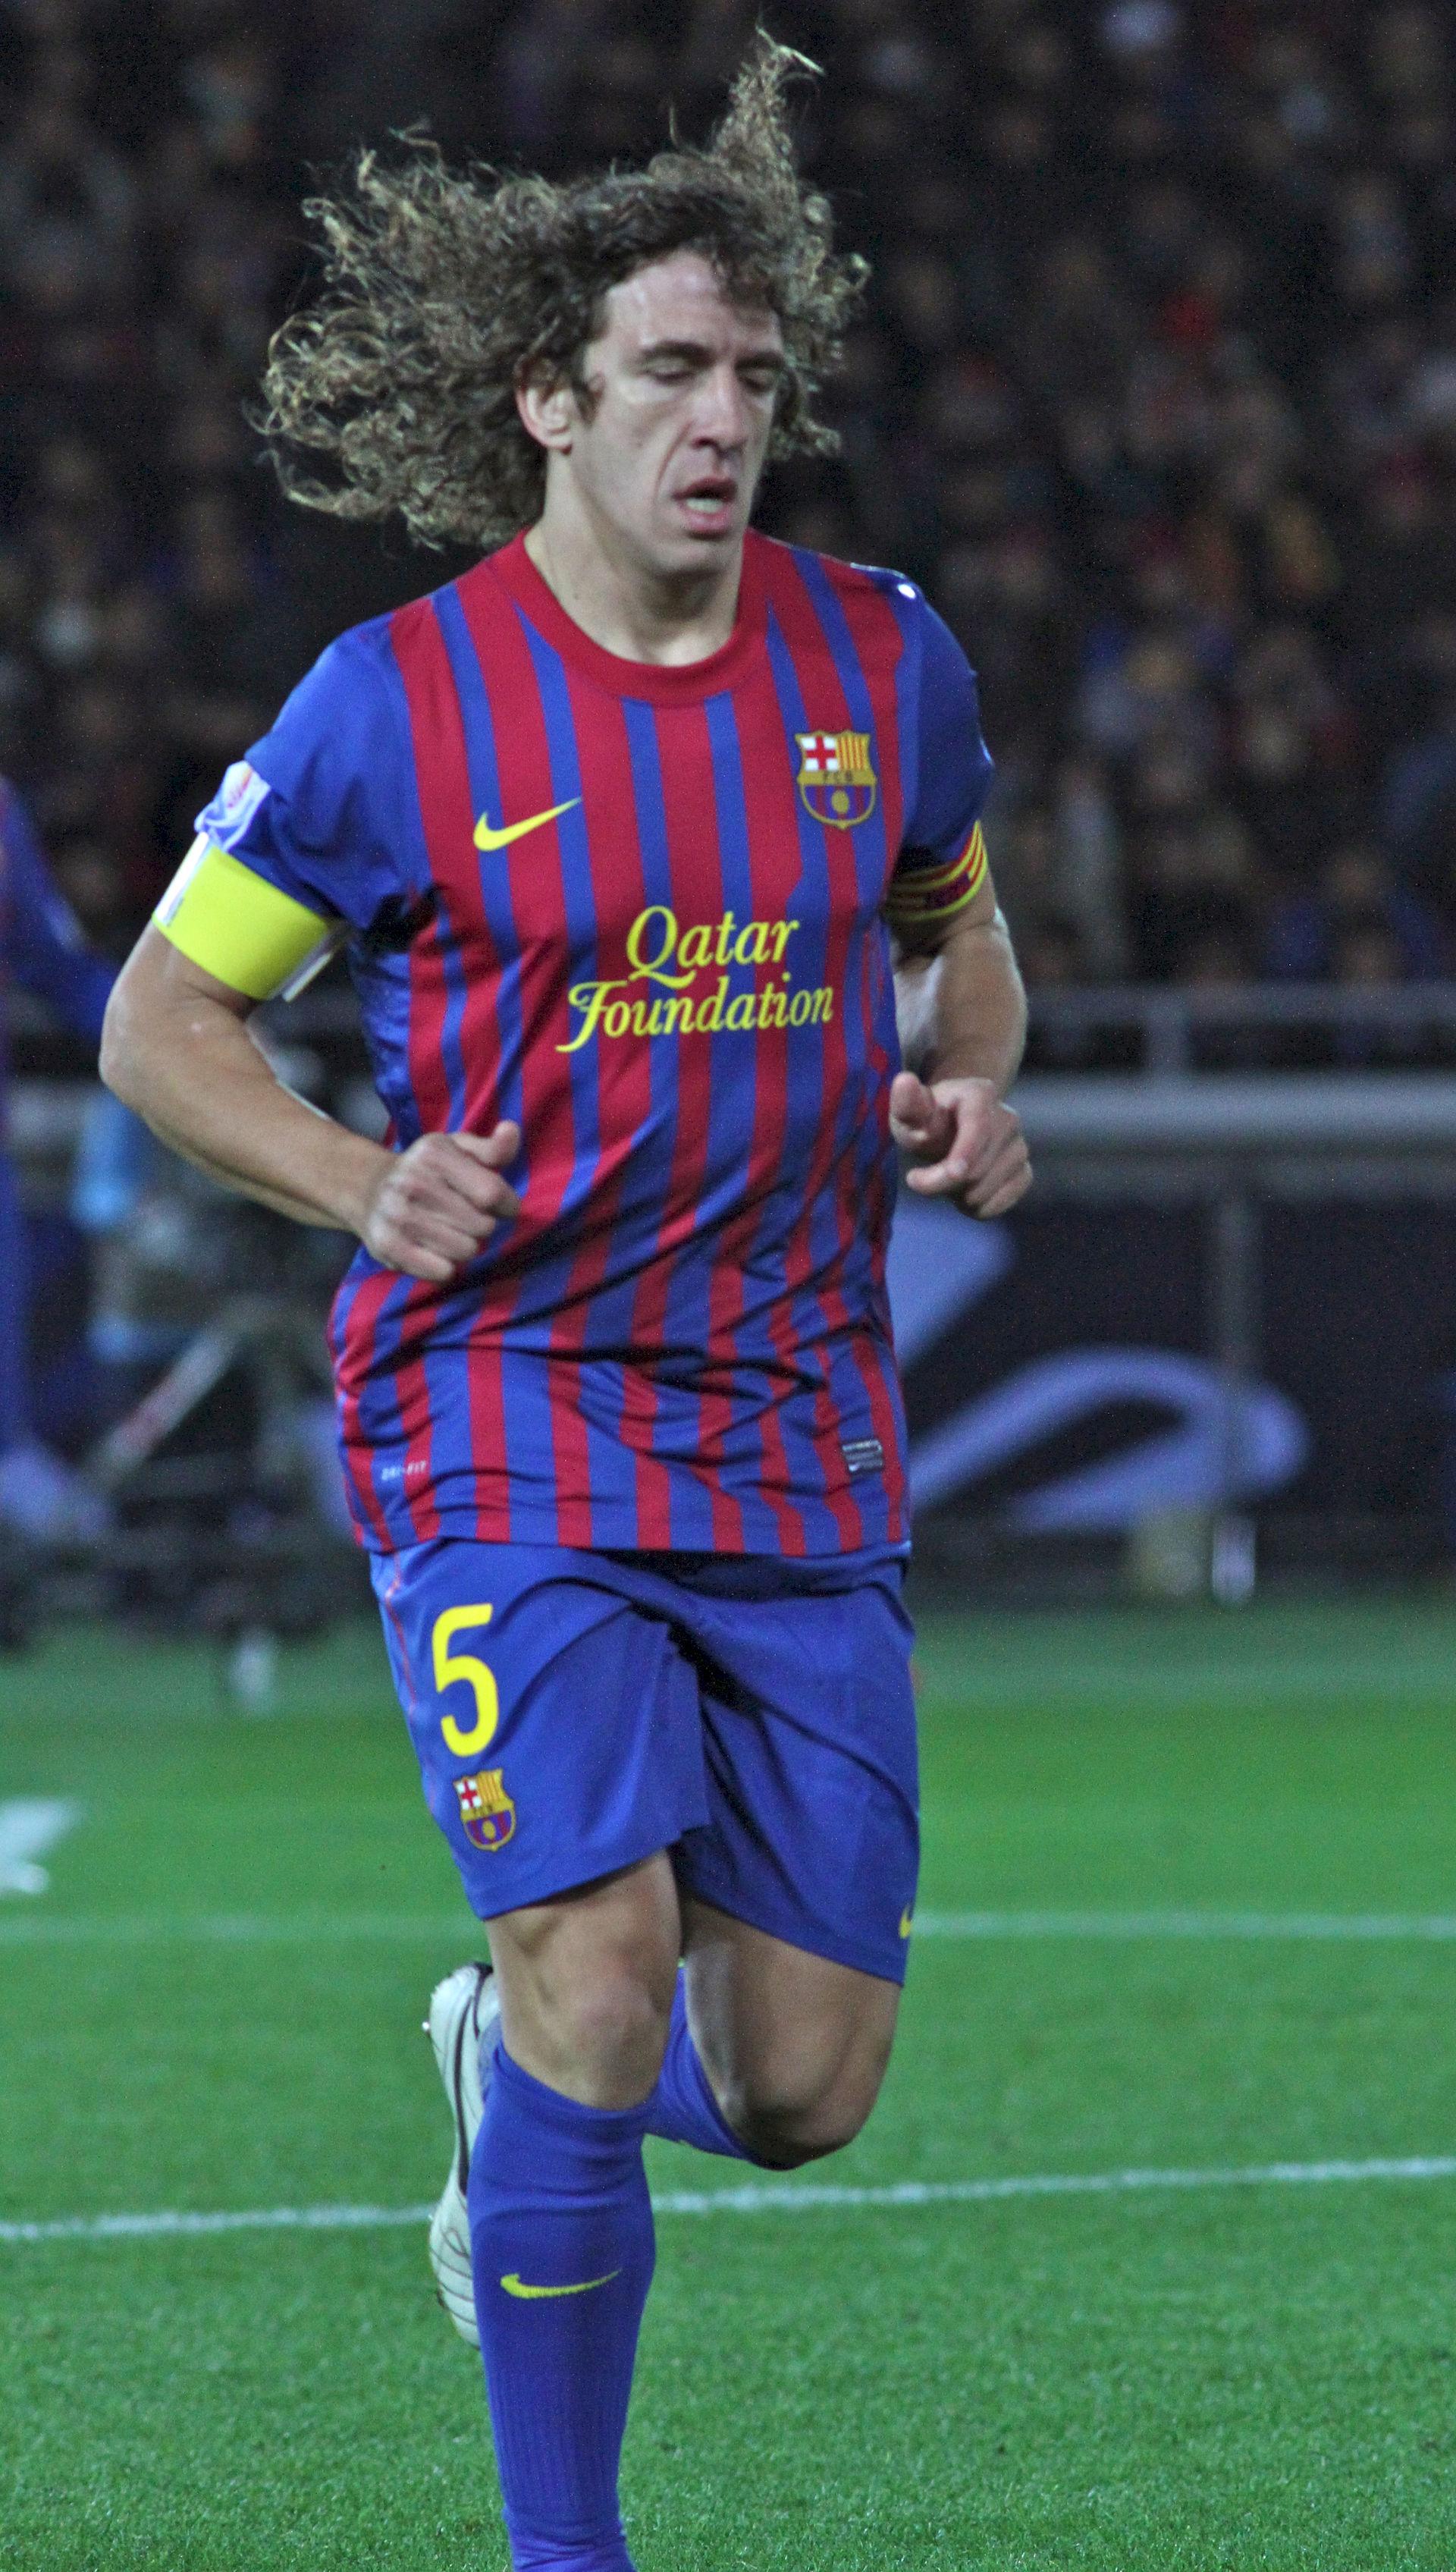 Photo of Carles Puyol: Spanish footballer